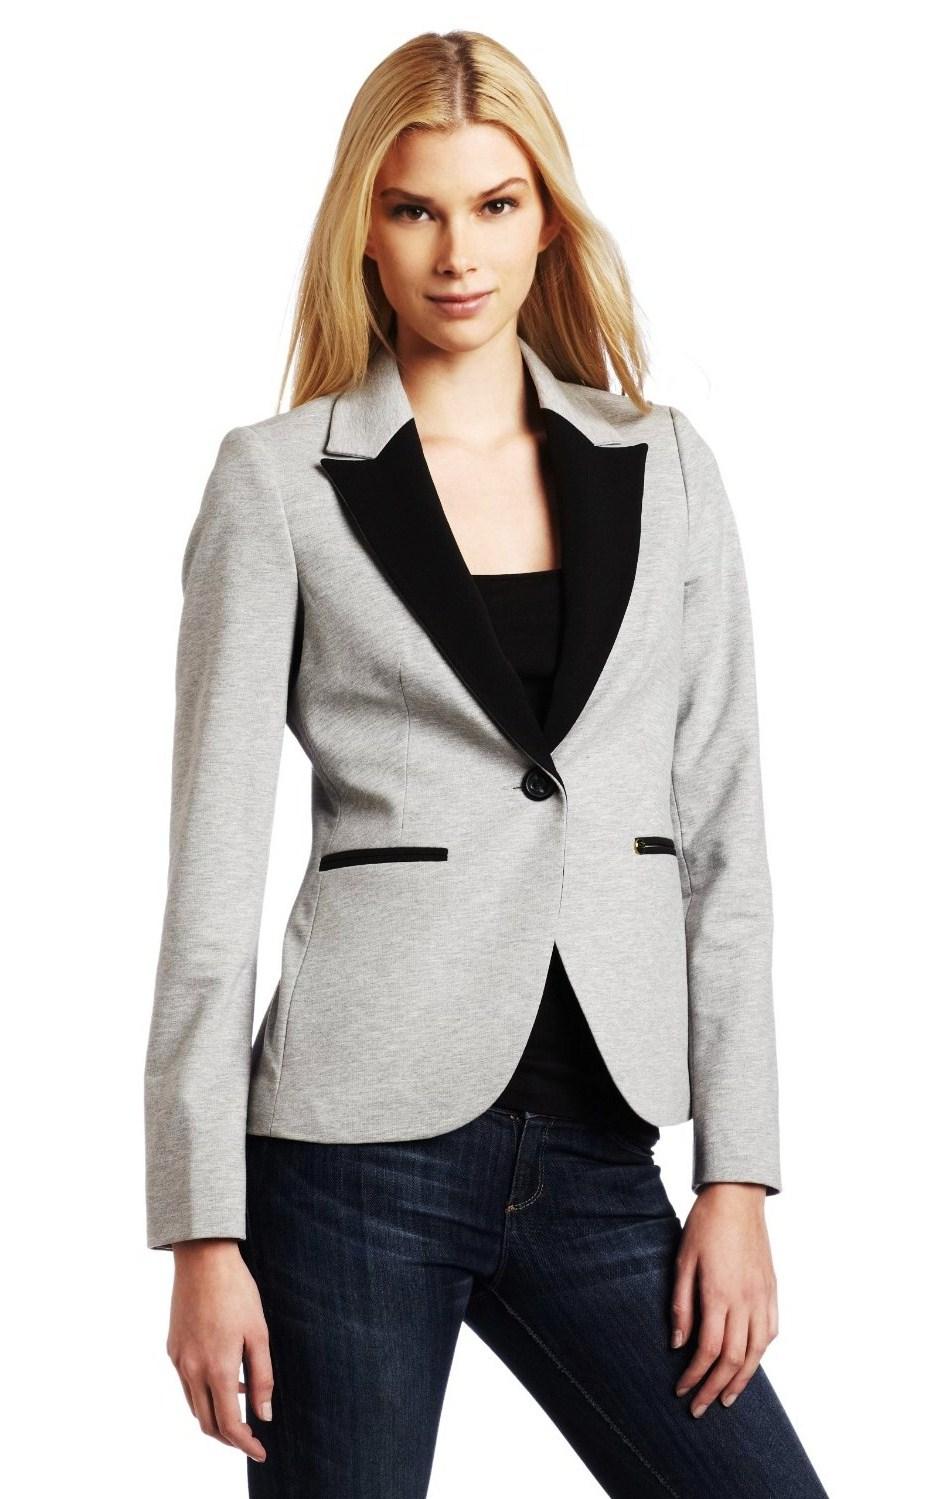 Blazers For Women Trendy Blazers For Women